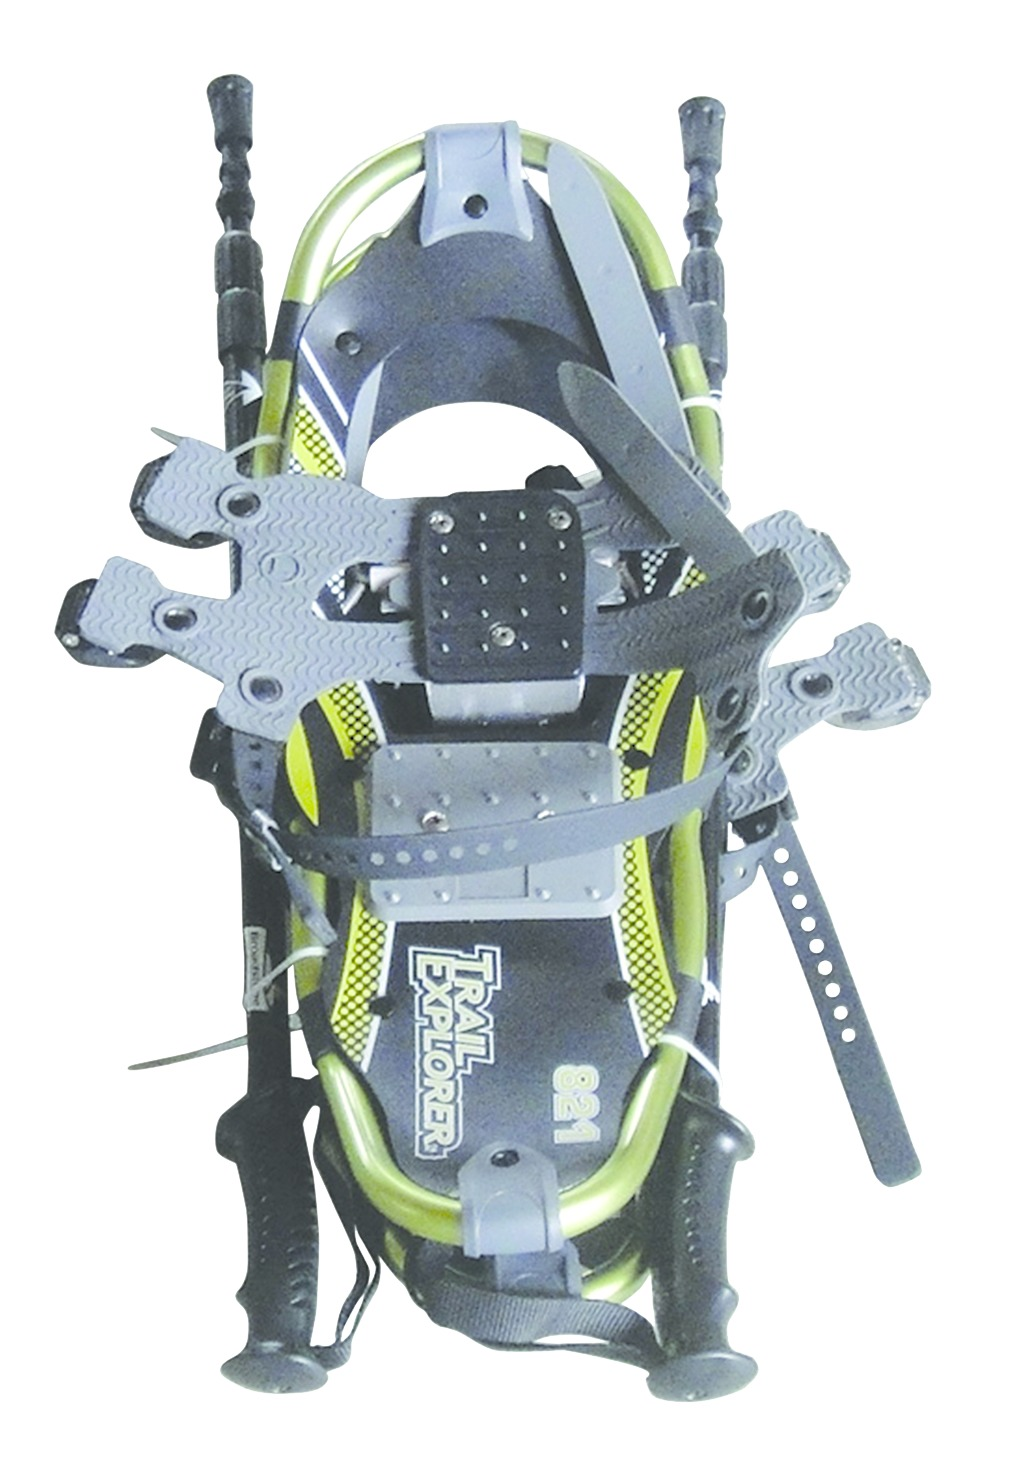 Expedition SSKIT-21 Trail Kit 8